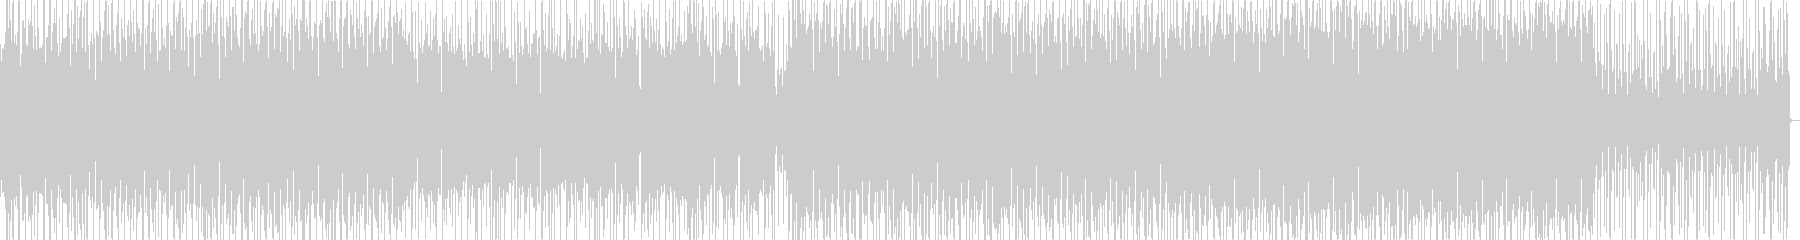 Simple, fashionable, electro BGM's unreproduced waveform